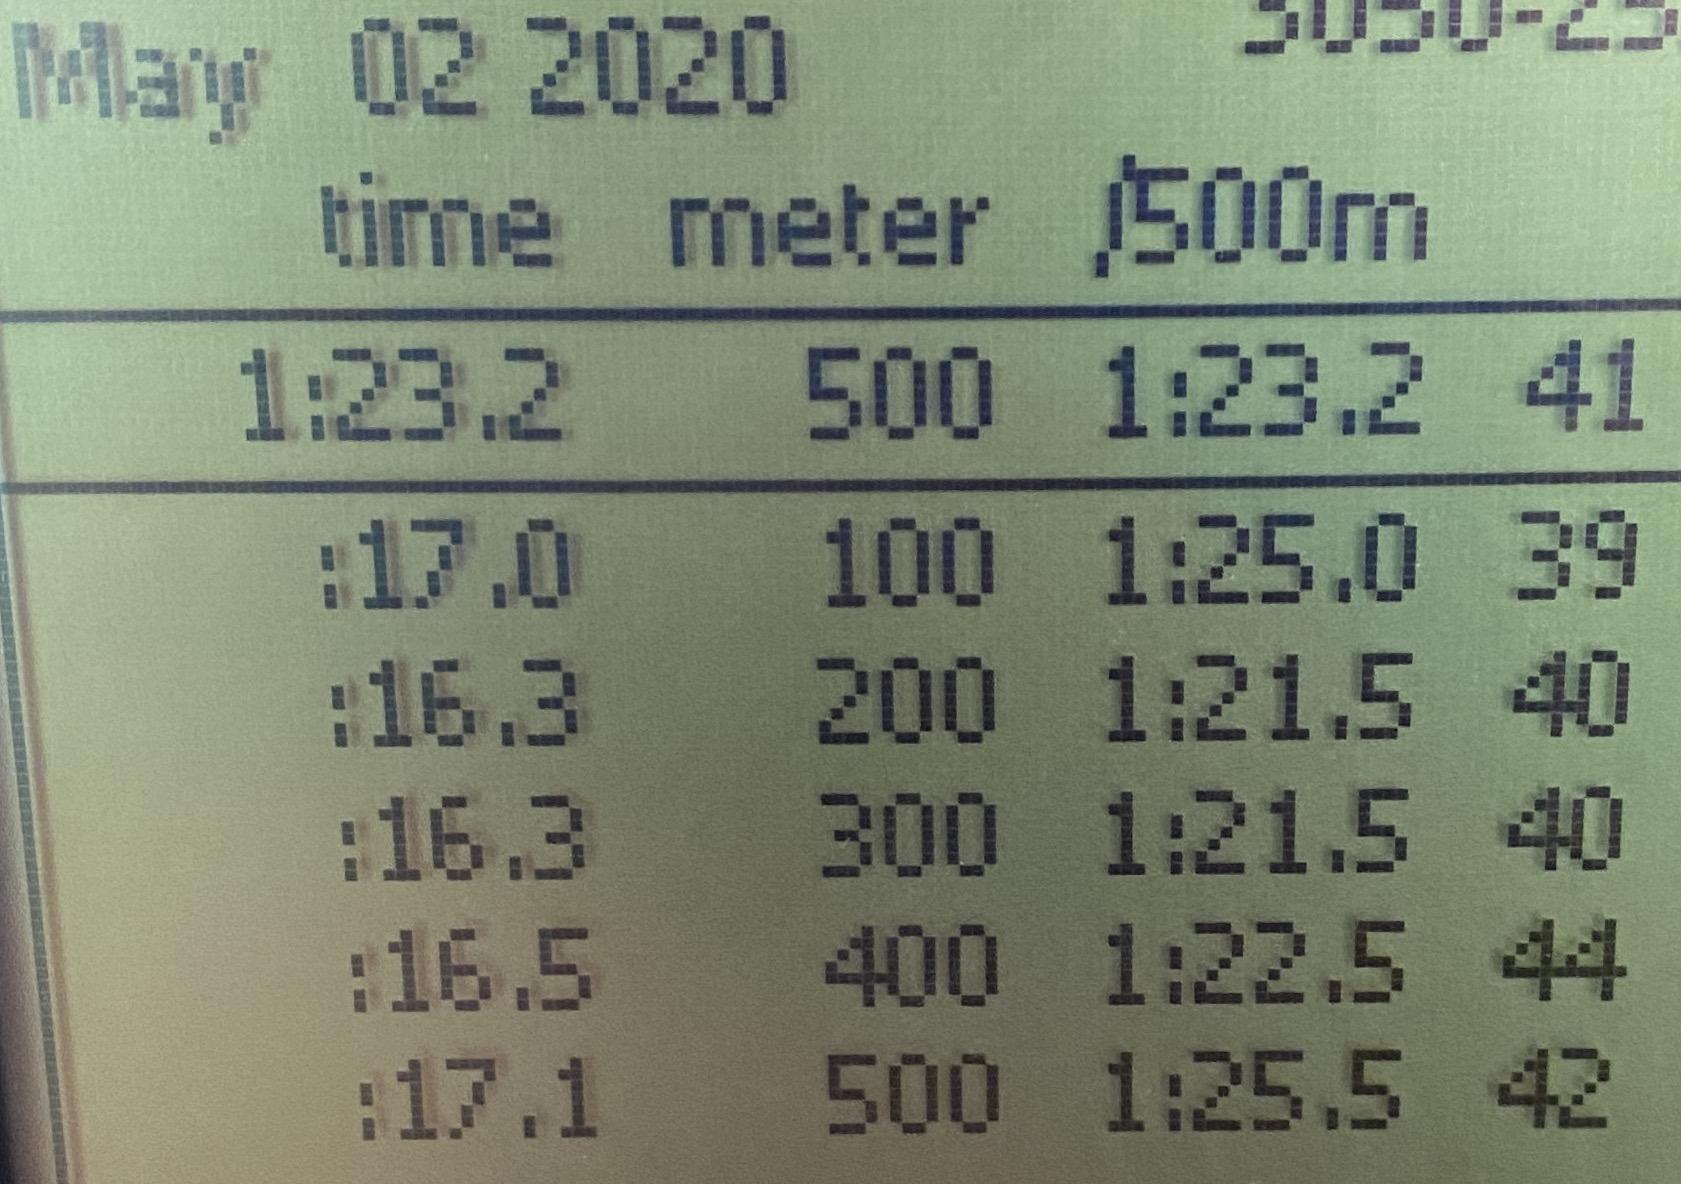 2020-05-02-500m-row.jpg